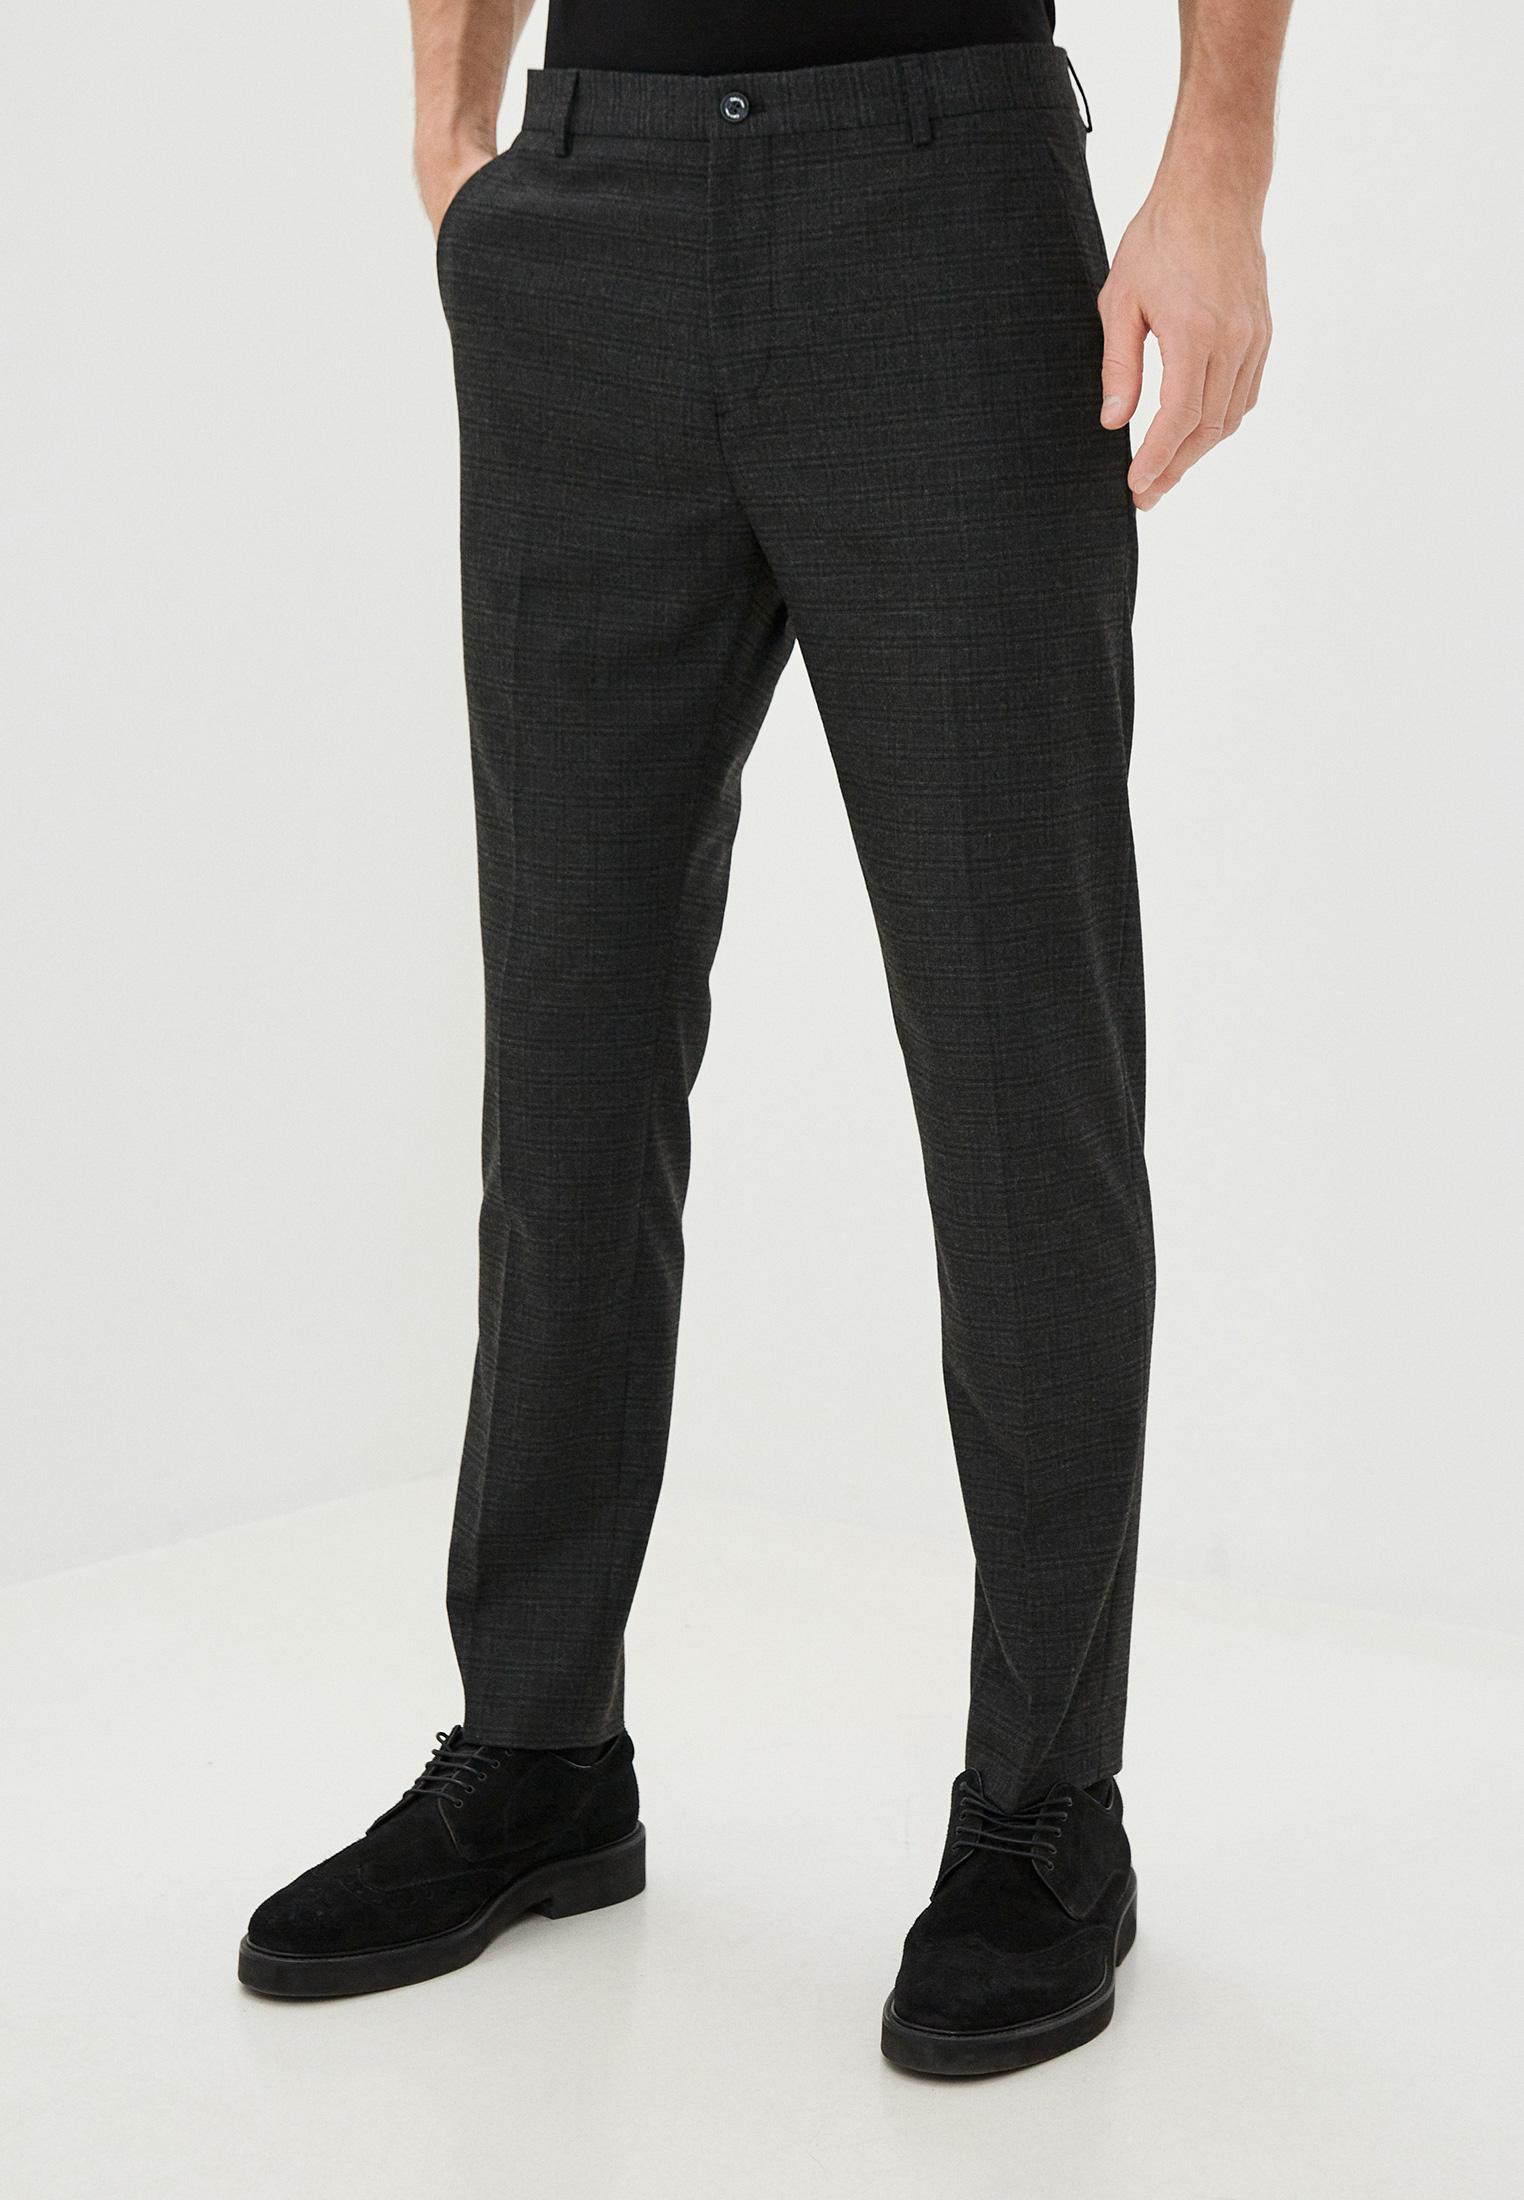 Мужские брюки Calvin Klein (Кельвин Кляйн) K10K106998